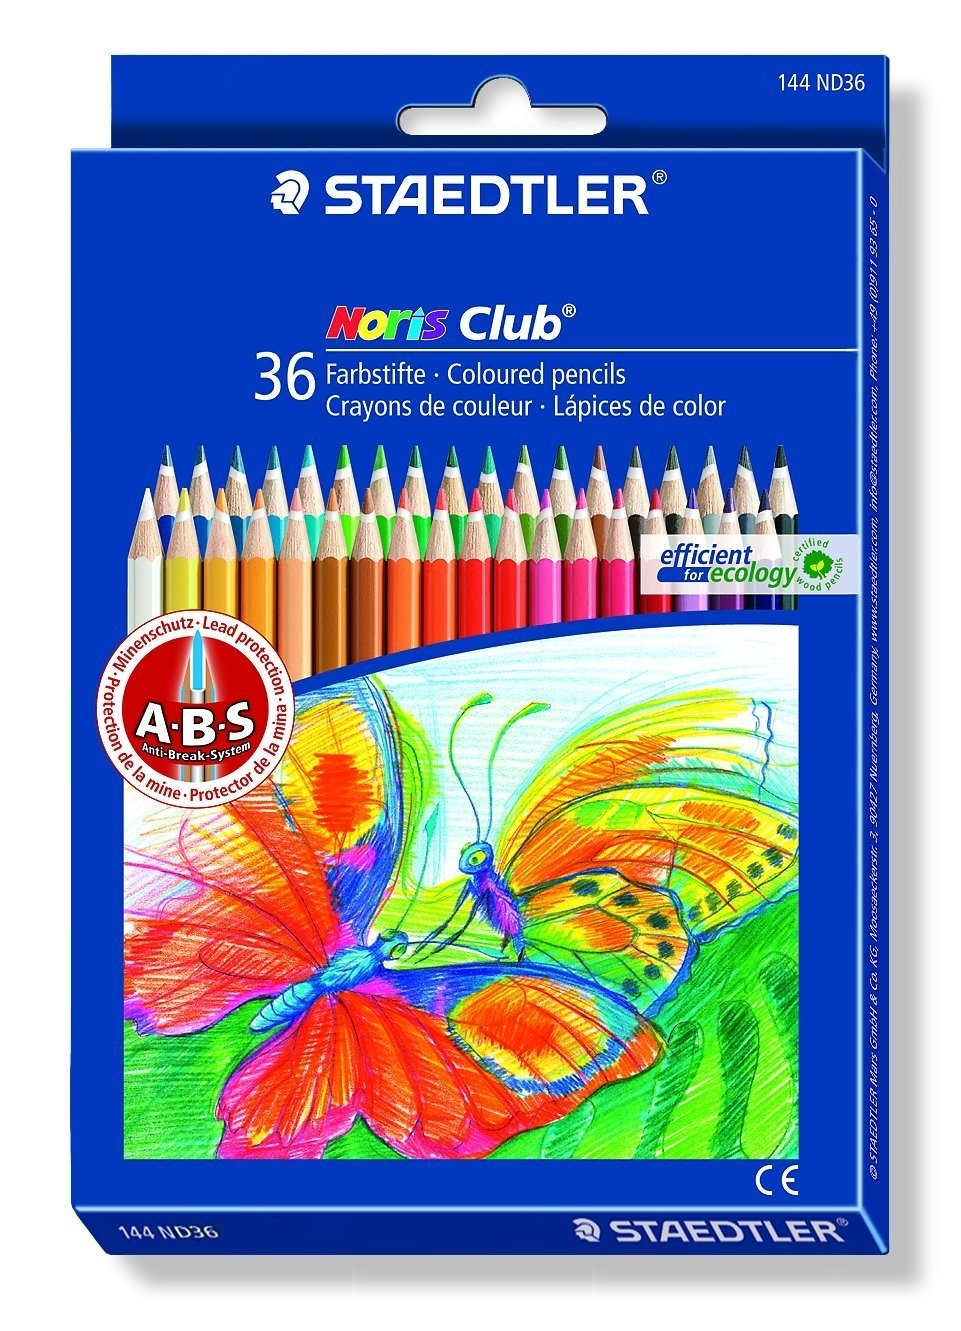 Staedtler - Noris Club Coloured Pencils - Pack of 36 image